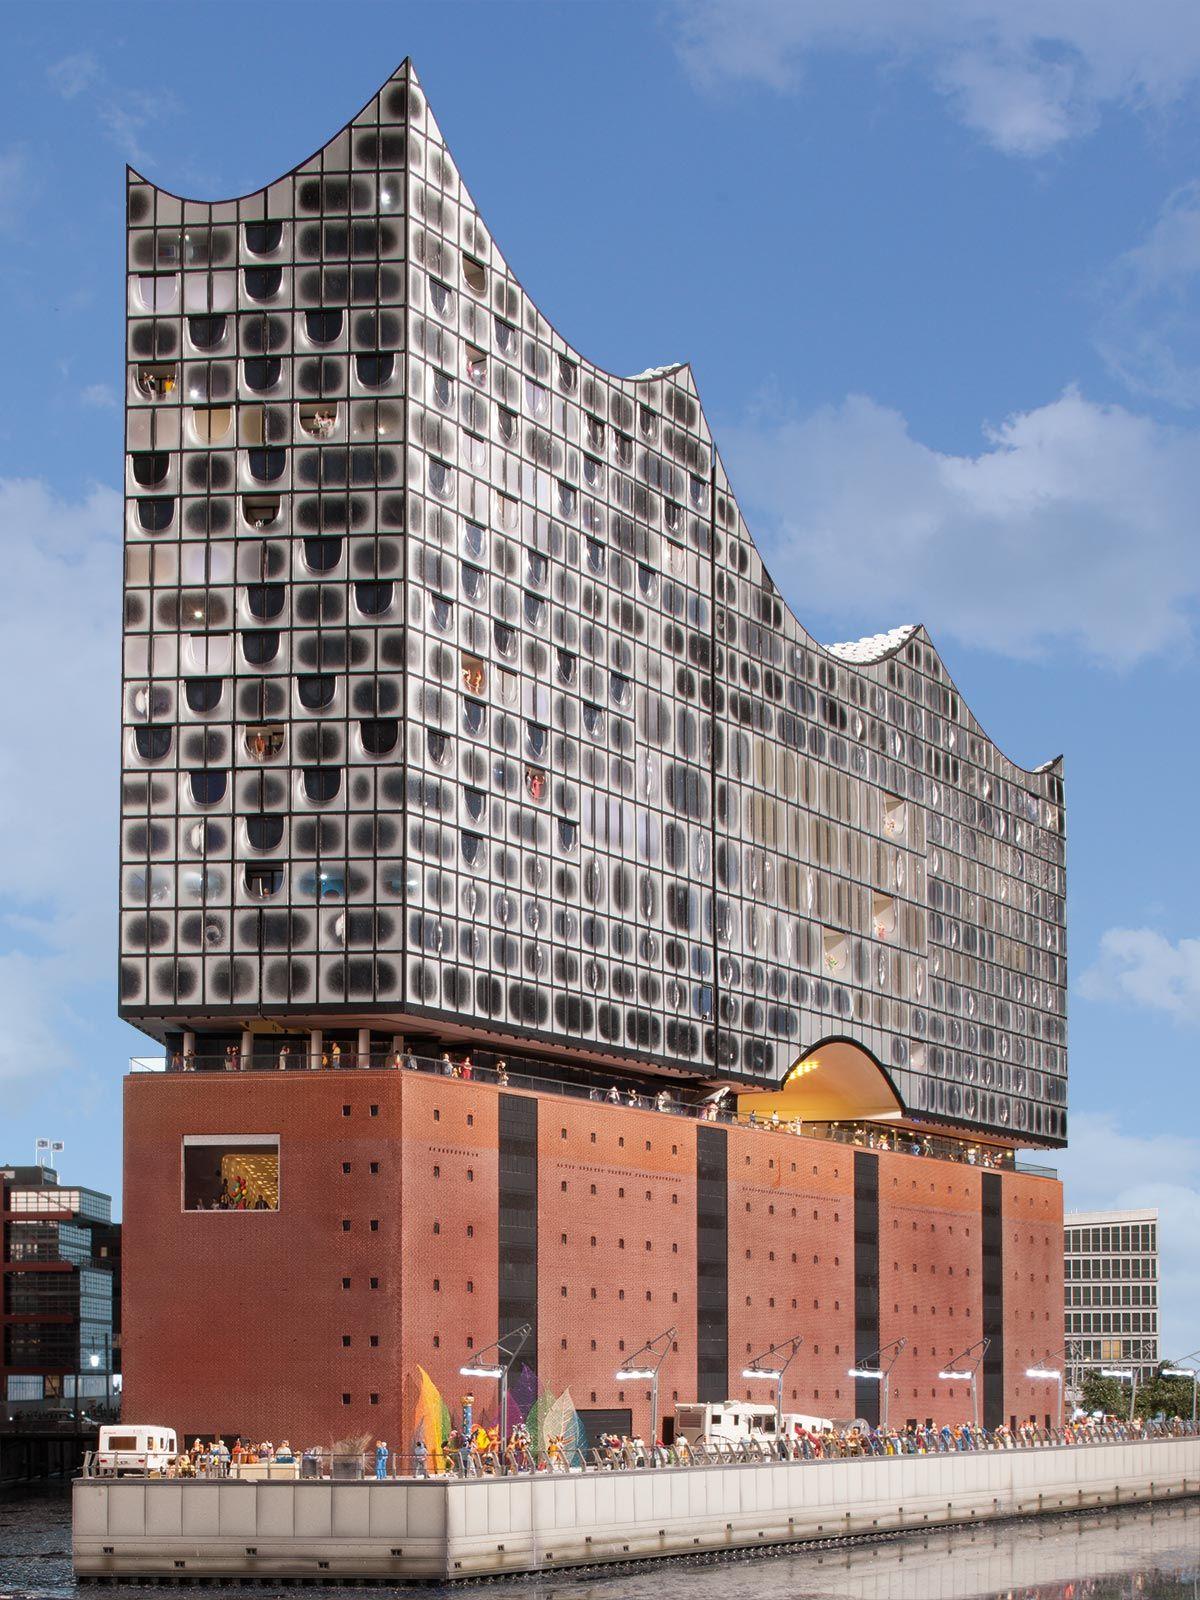 Elbphilharmonie Architecture Model Architecture Building Contemporary Architecture